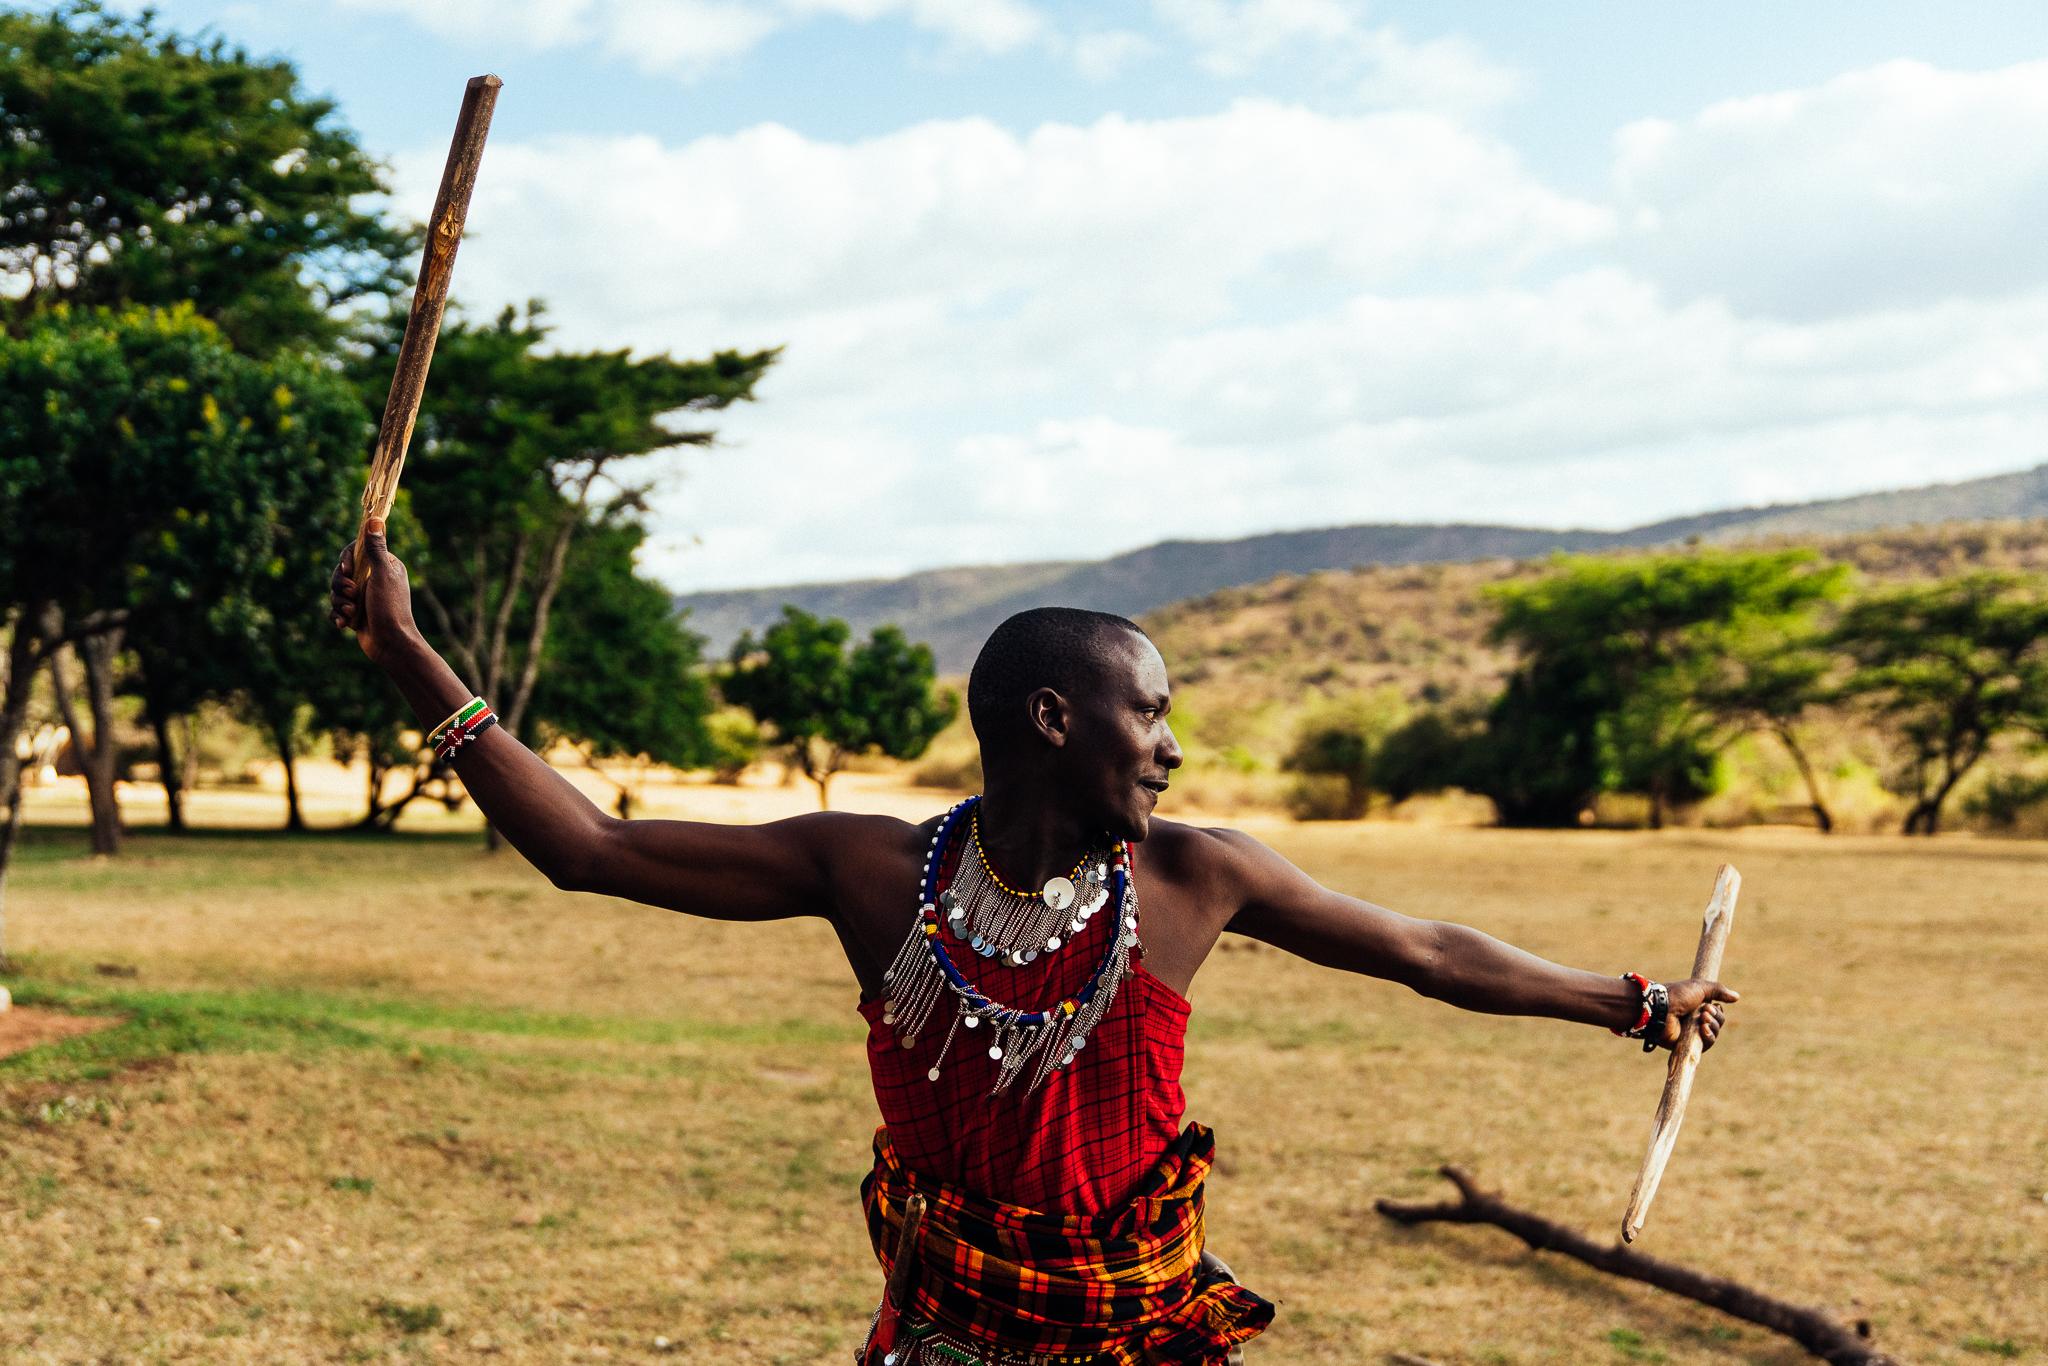 Maasai Warrior Ph. Dave Krugman